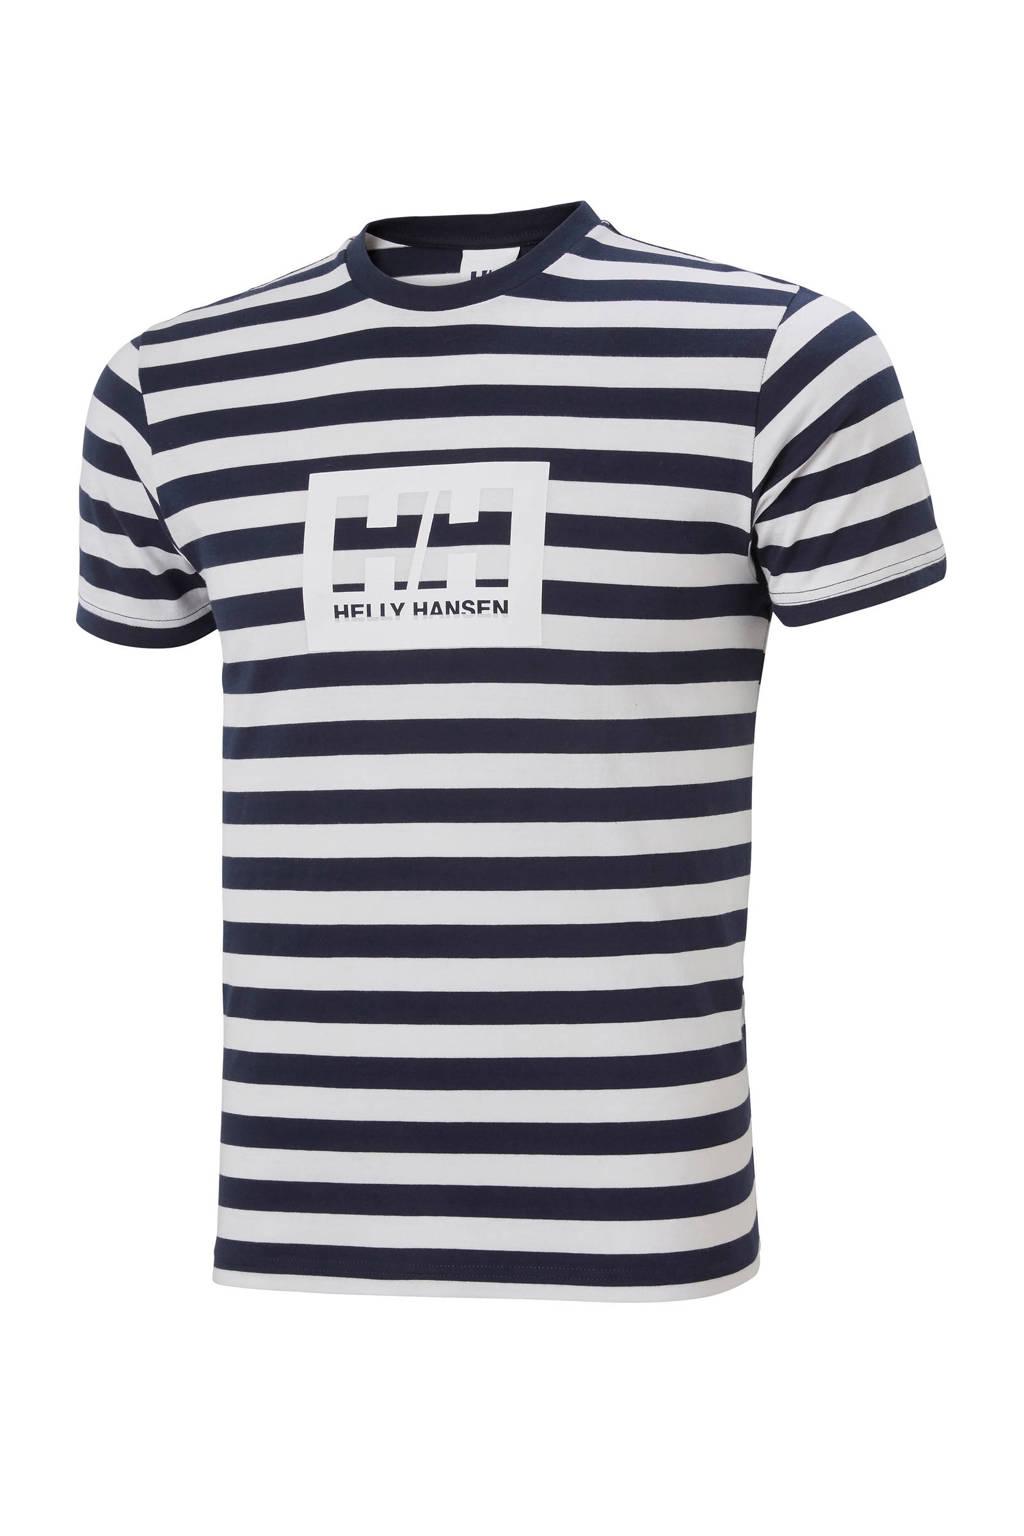 Wit/blauw gestreept heren t-shirt Helly Hansen Tokyo T-shirt - 53285-598